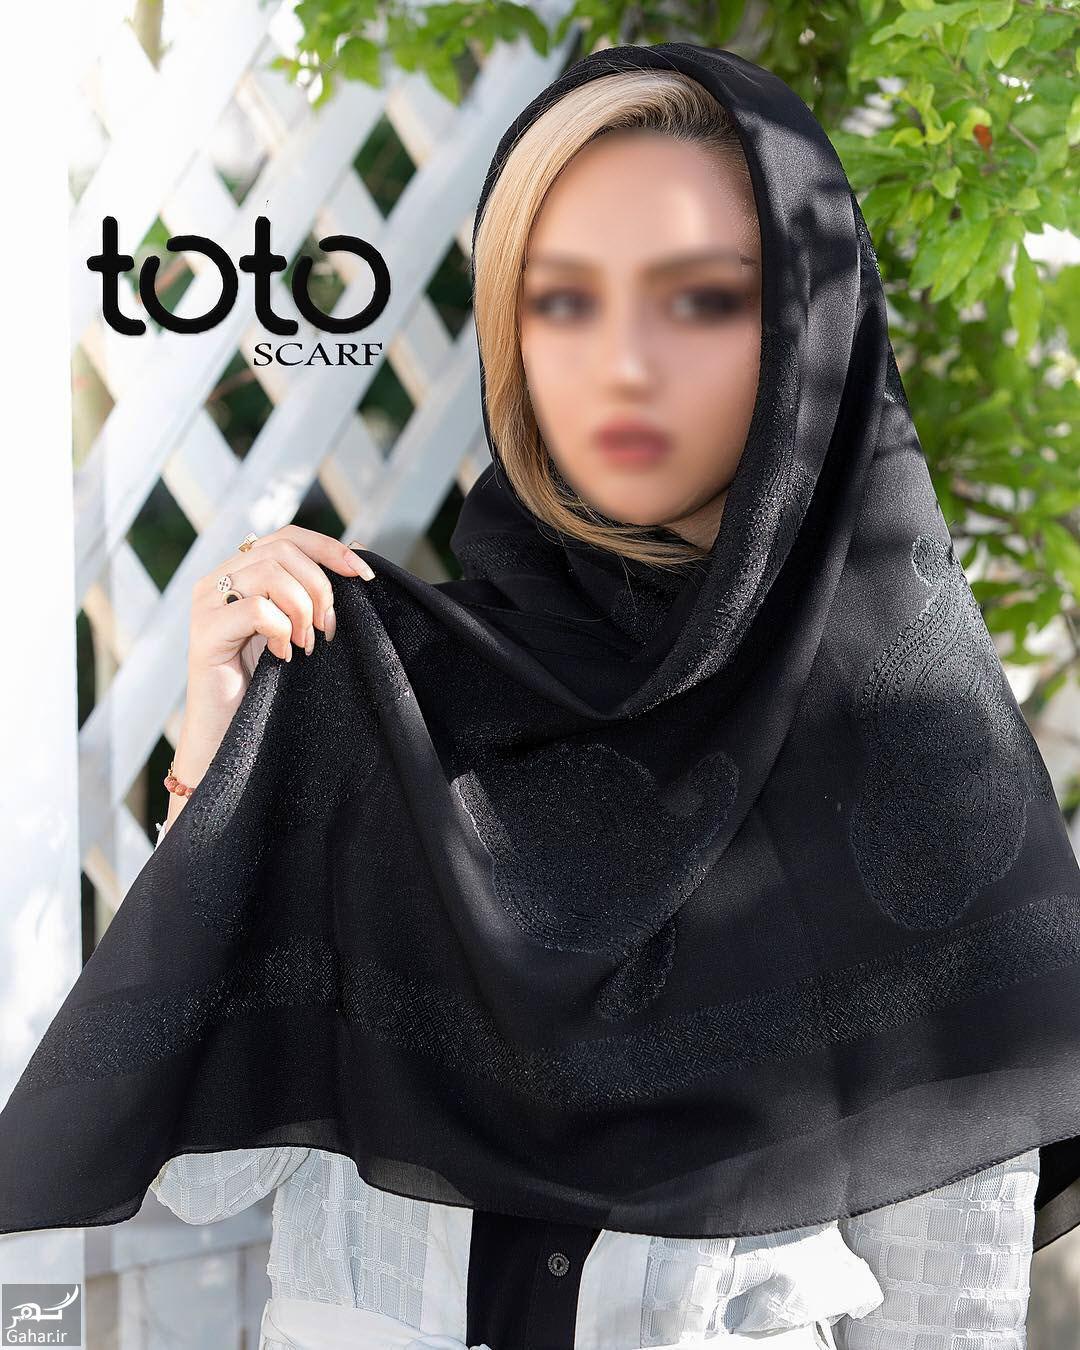 386623 Gahar ir جدیدترین مدل های شال و روسری از برند ایرانی توتو